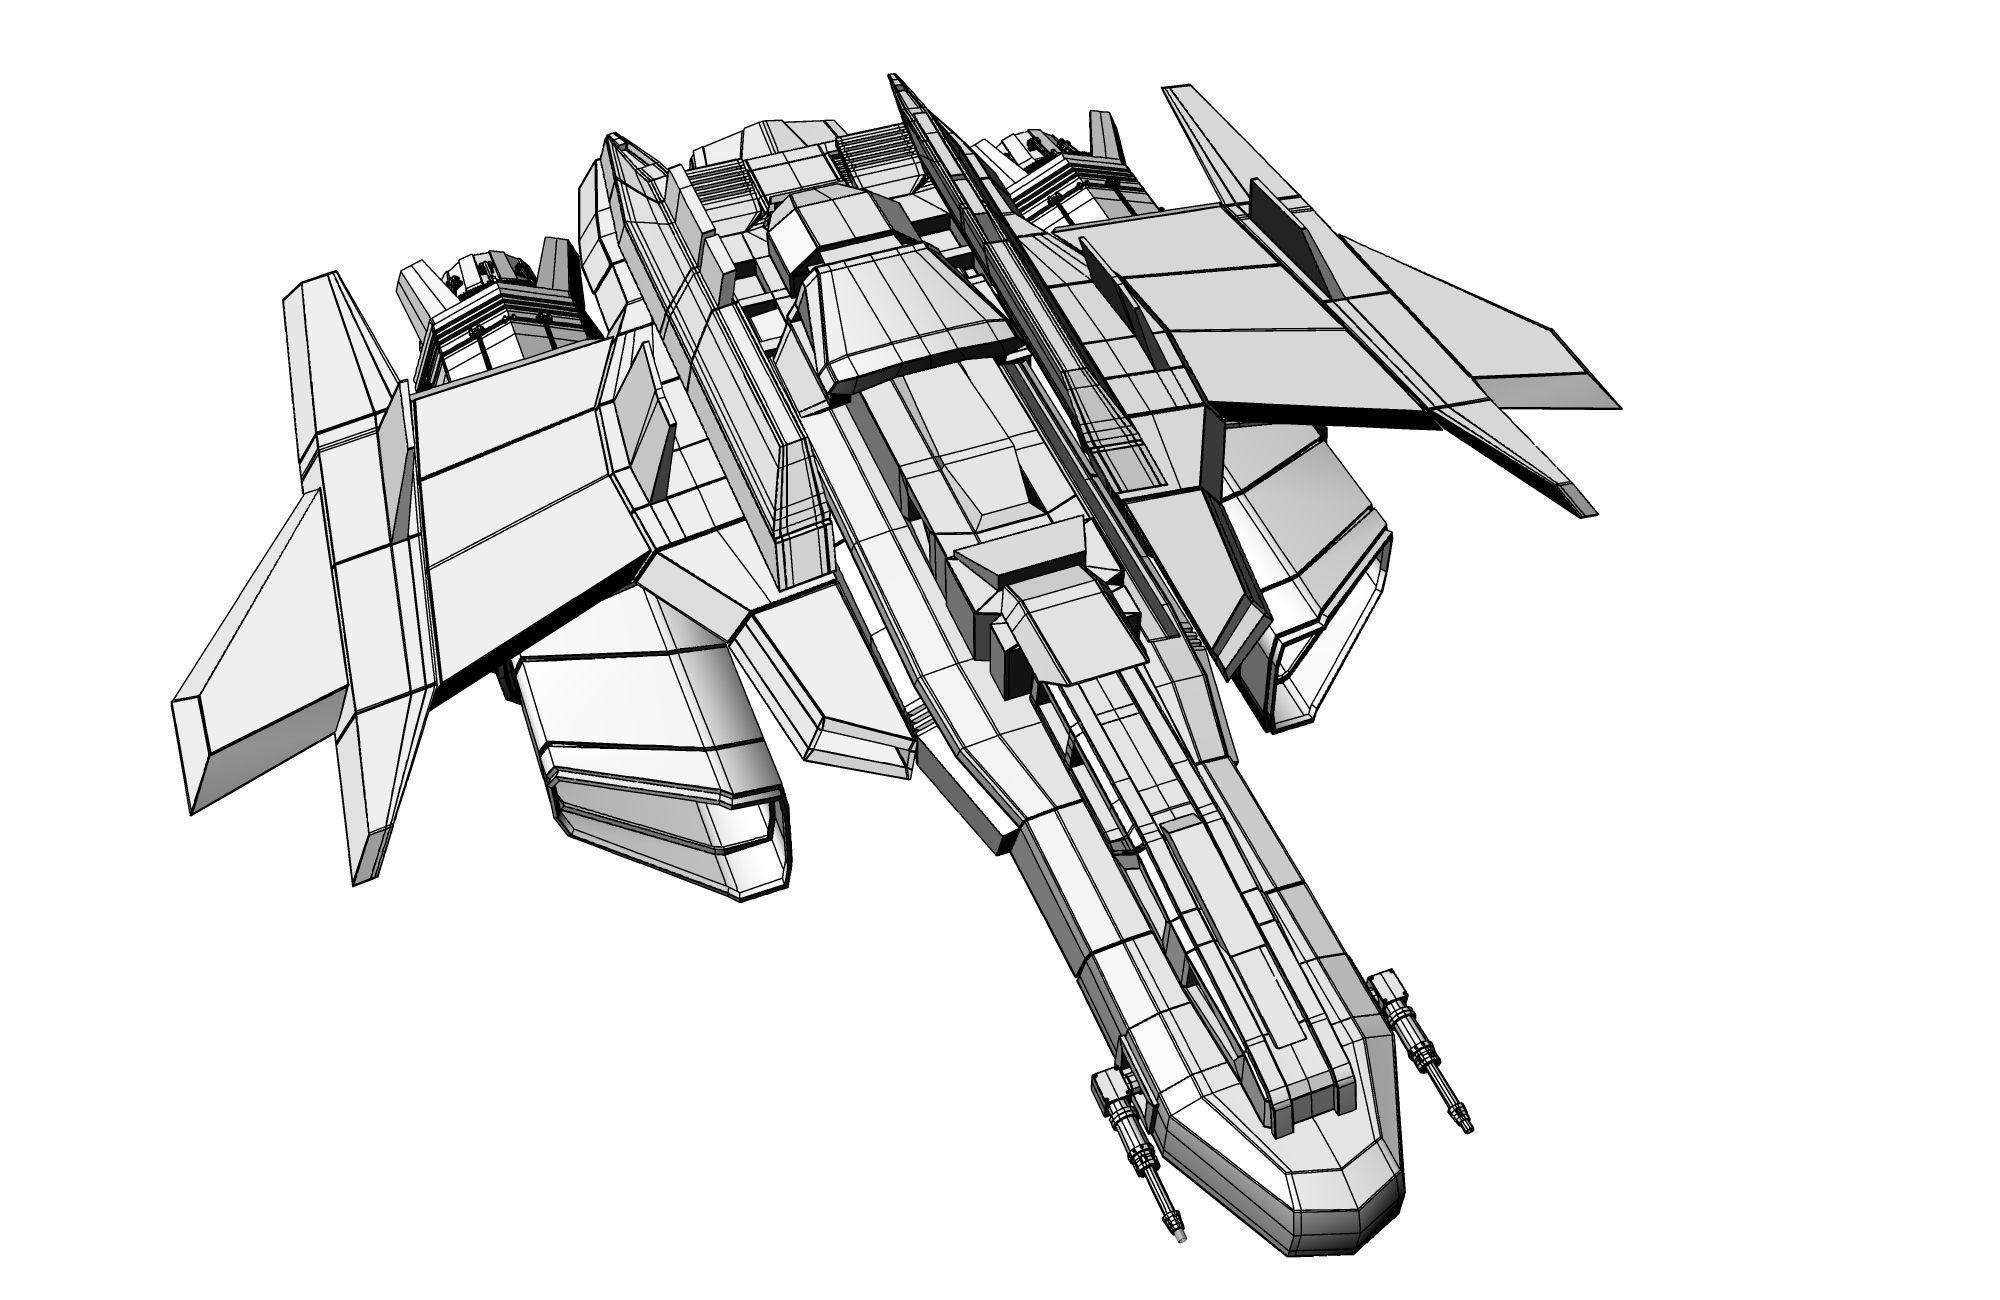 2000x1300 3d Model Spaceship Spacecraft Jet Cgtrader